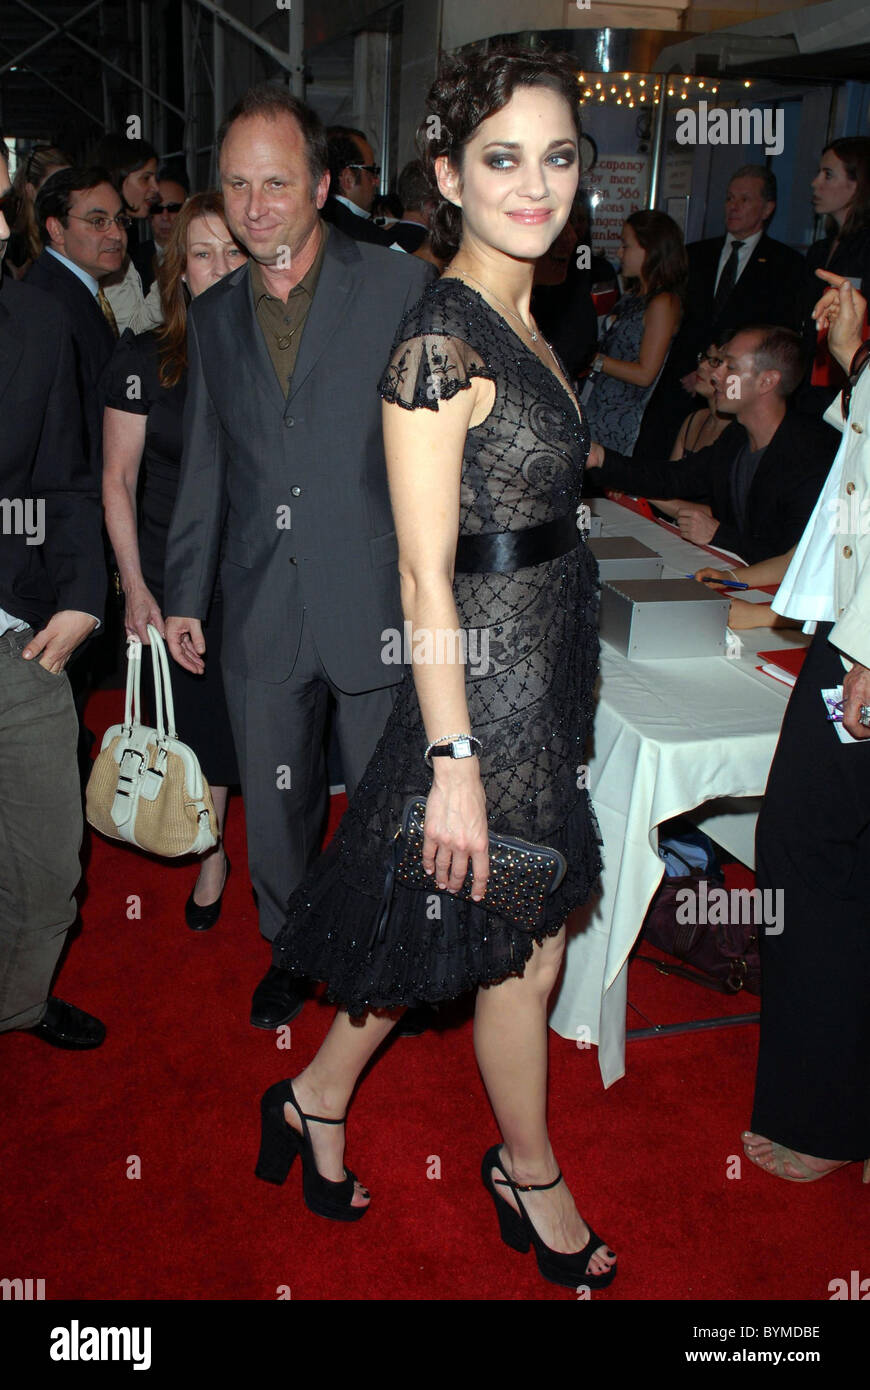 Marion Cotillard Premiere Of La Vie En Rose Held At Paris